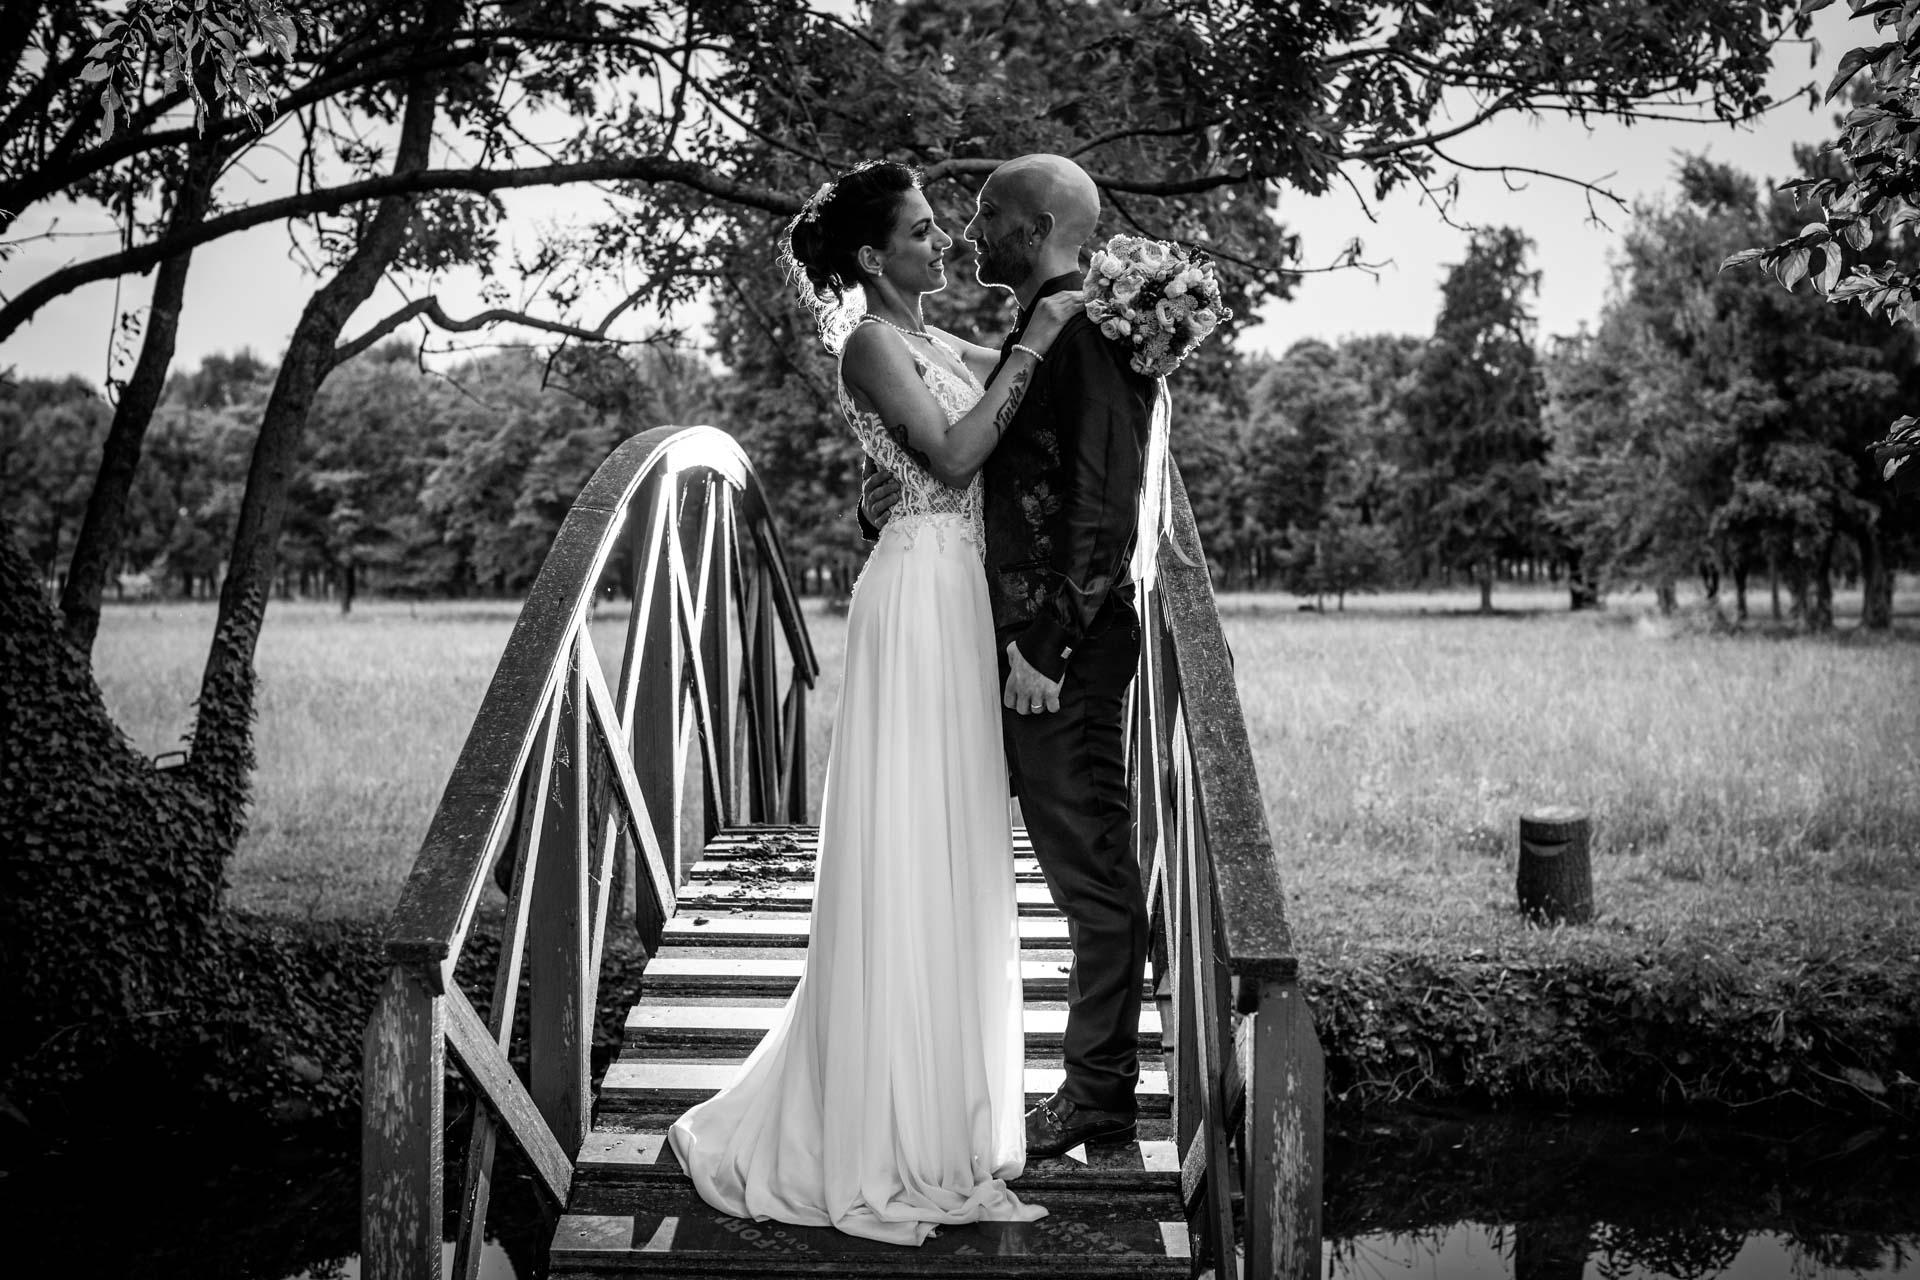 sposi abbraccio ponte bianco nero